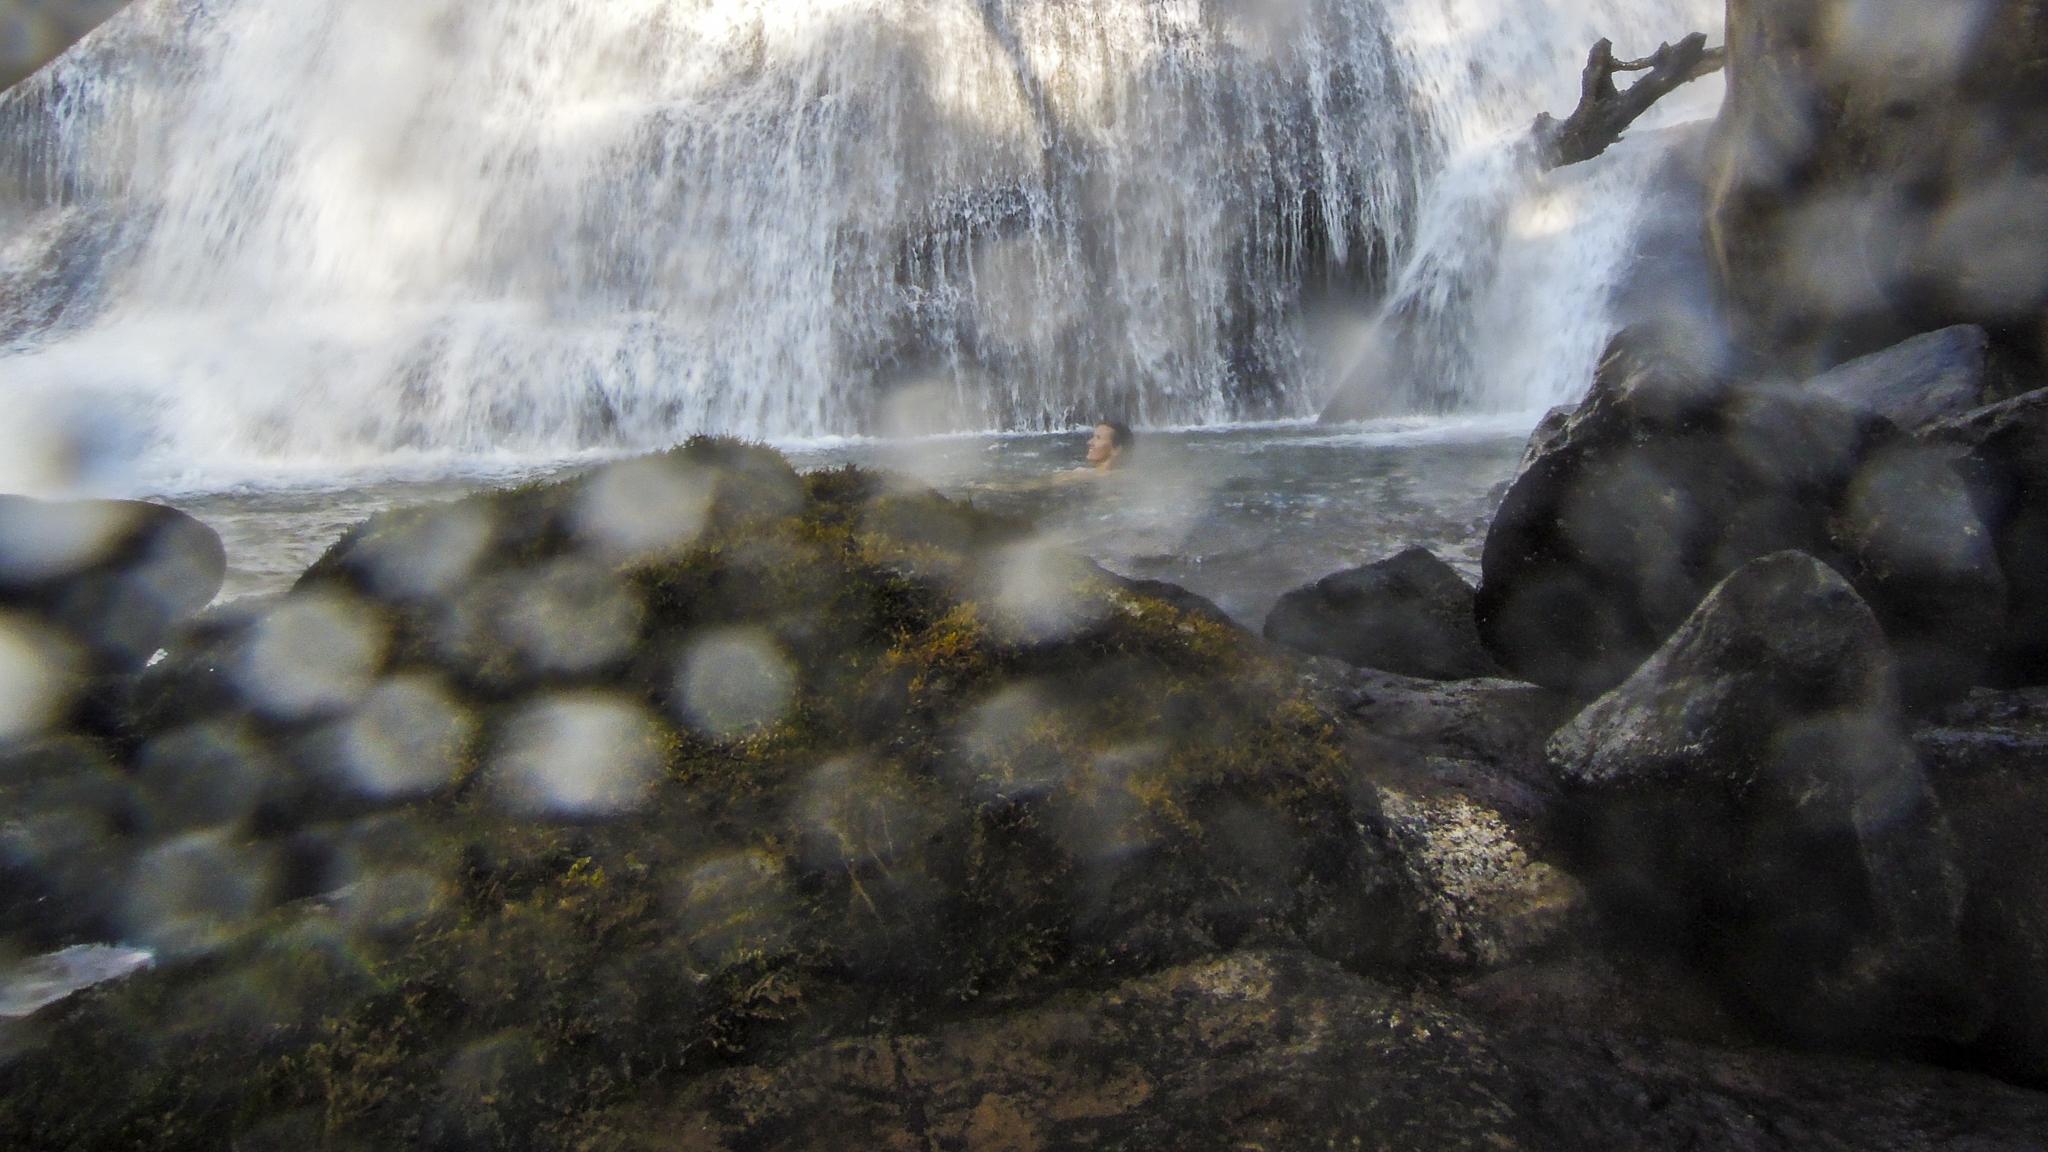 Laos Bolaven-Plateau Waterfall Wasserfall Forschungs-Sabbatical organic17